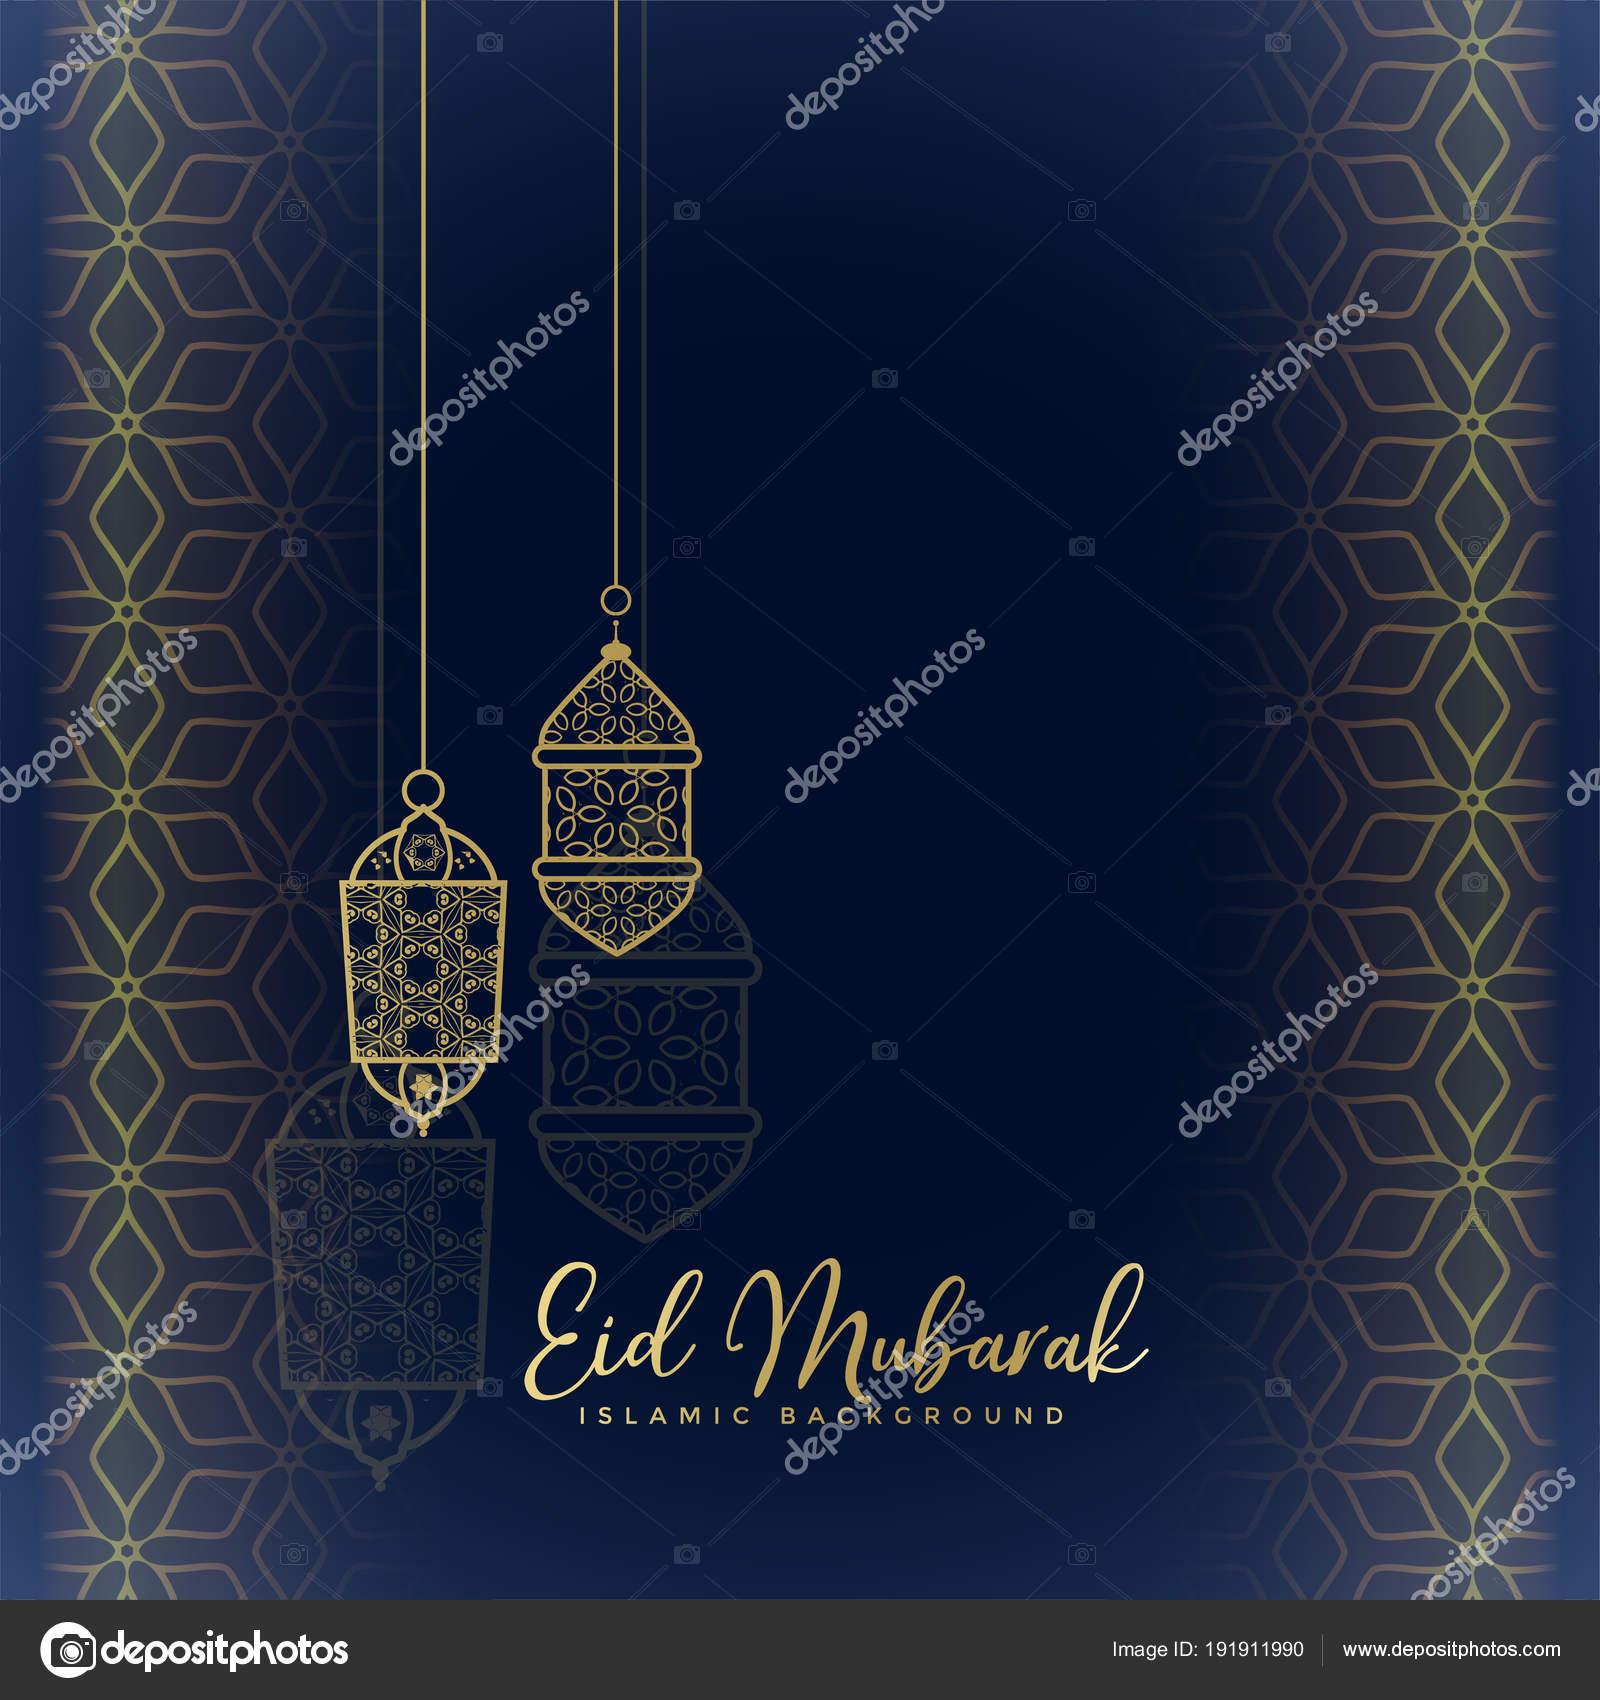 Eid Mubarak Greeting With Hanging Lanterns Stock Vector Starline